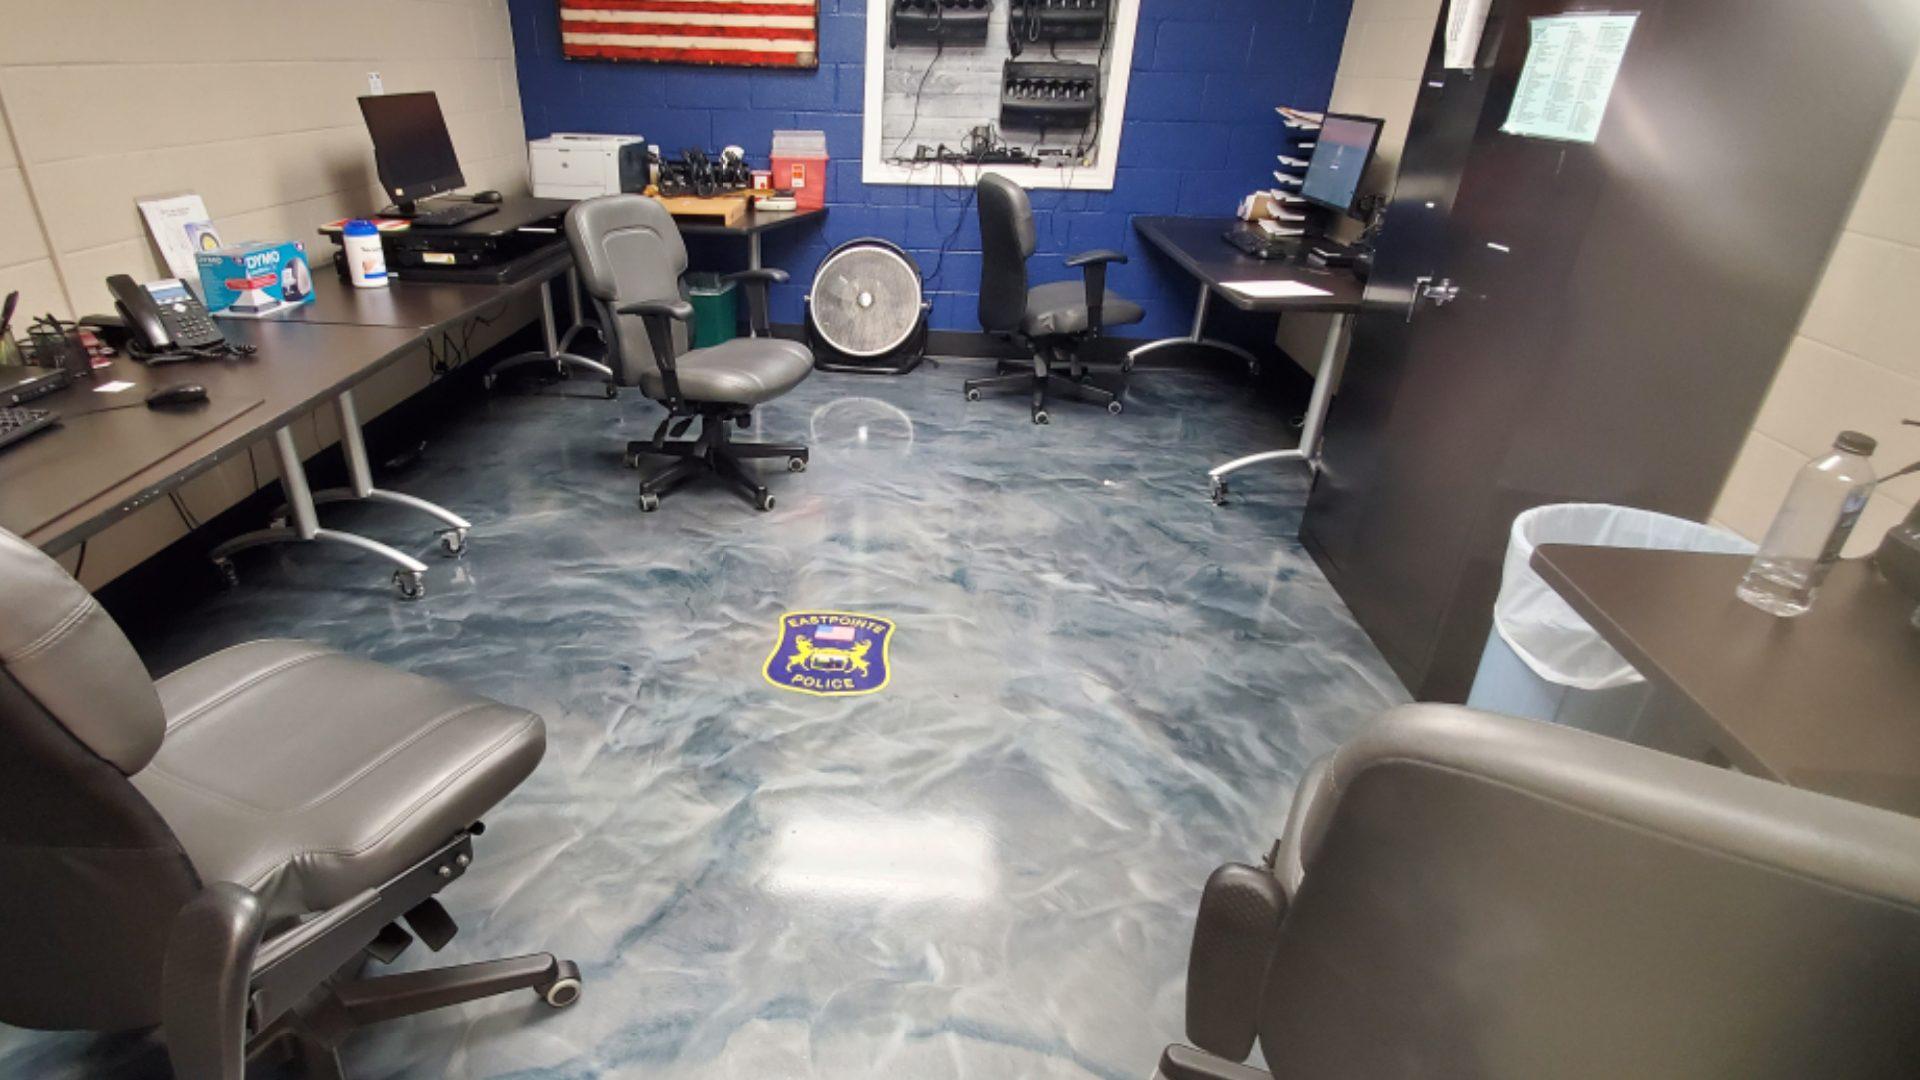 Eastpointe Police Epoxy Floor Graphic 2